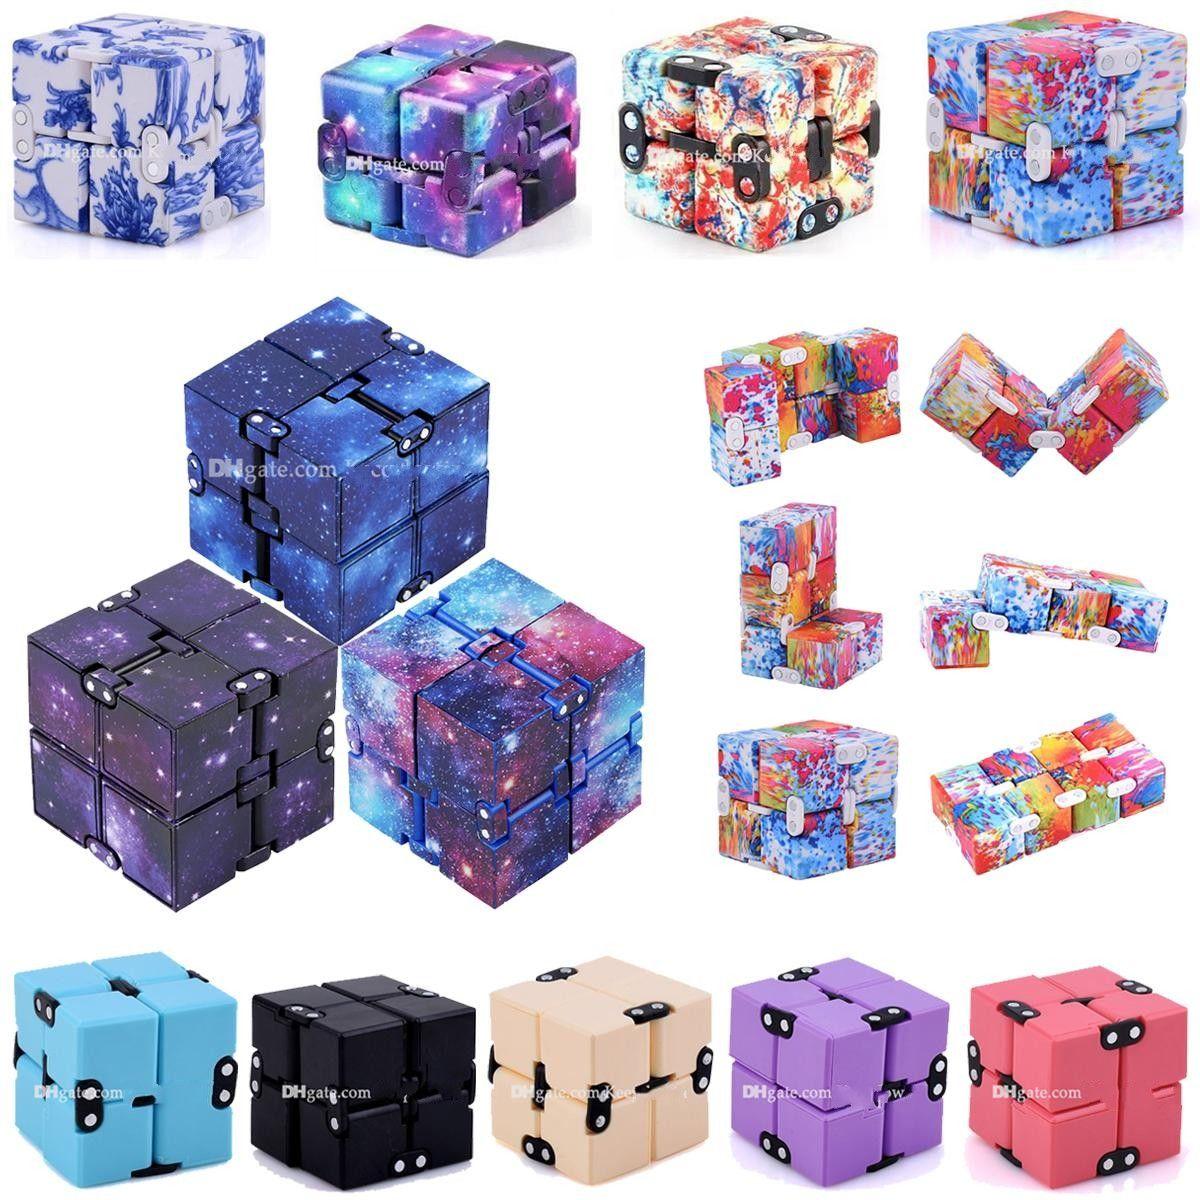 DHL Barco Tiktok Infinity Halloween Christmas Magic Cube Cielo creativo Fidget Antistress Toys Office Flip Puzzle Mini Blocks Decompresión Divertido Juguete